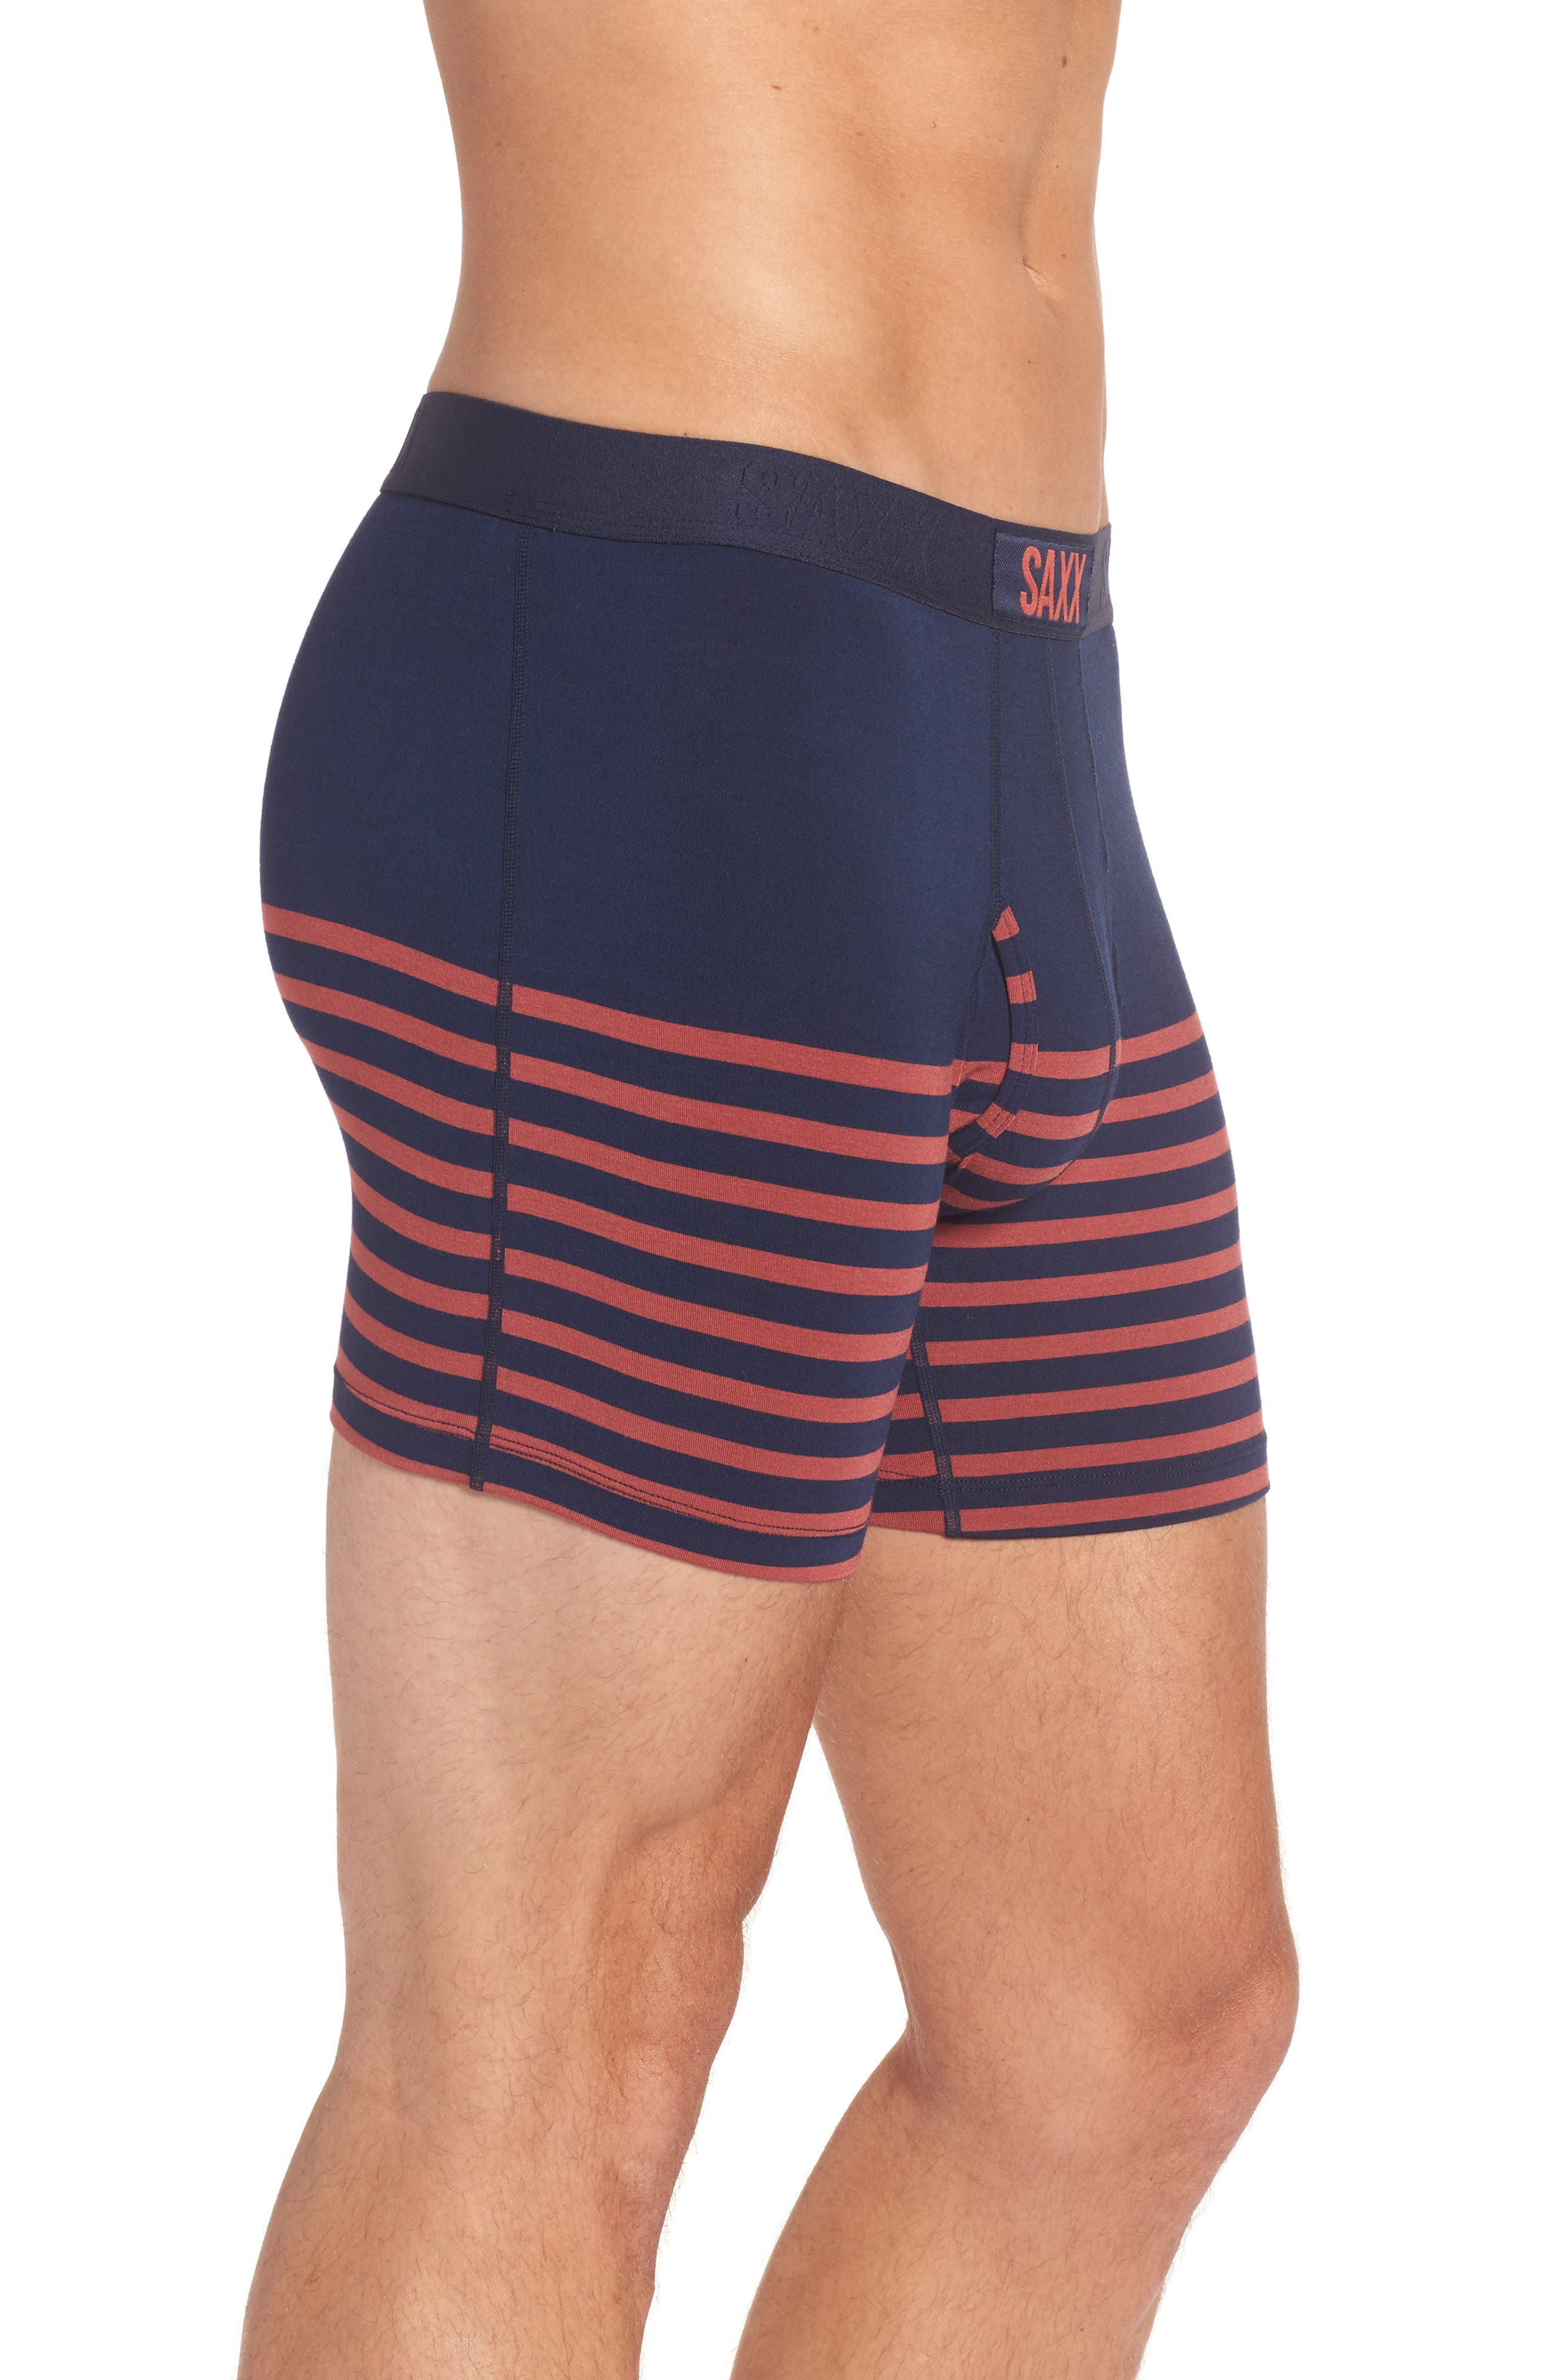 Ultra Boxer Briefs,                             Alternate thumbnail 3, color,                             Sailor Stripe